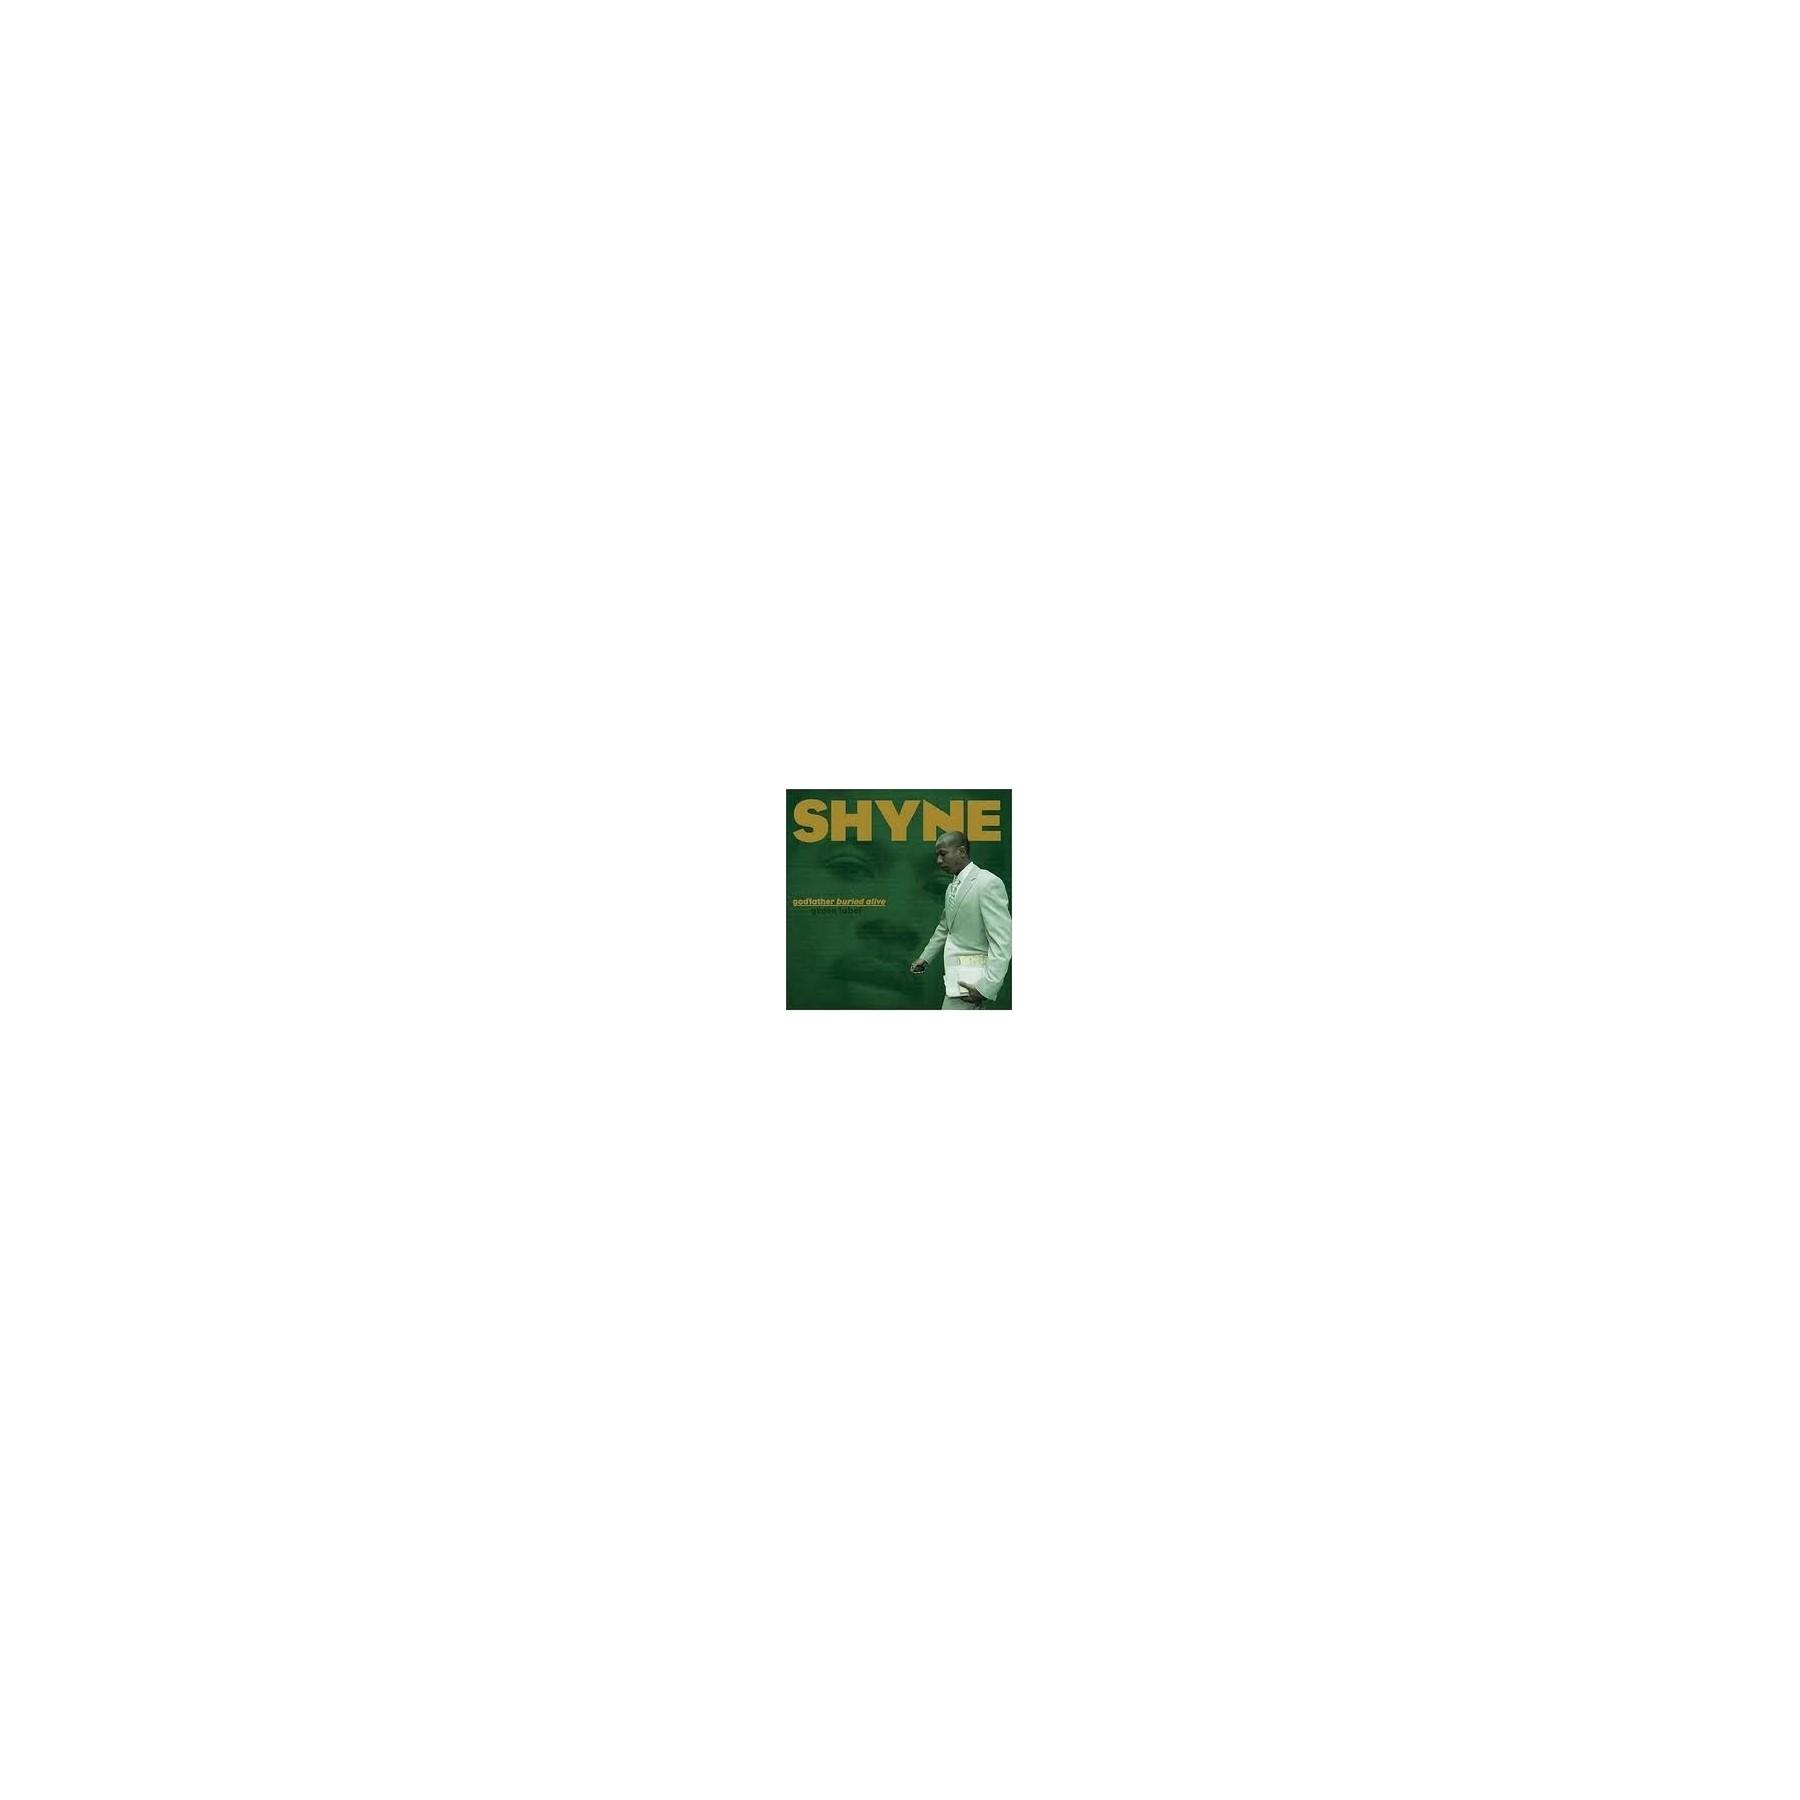 VINILE SHYNE - GODFATHER BURIED ALIVE stg